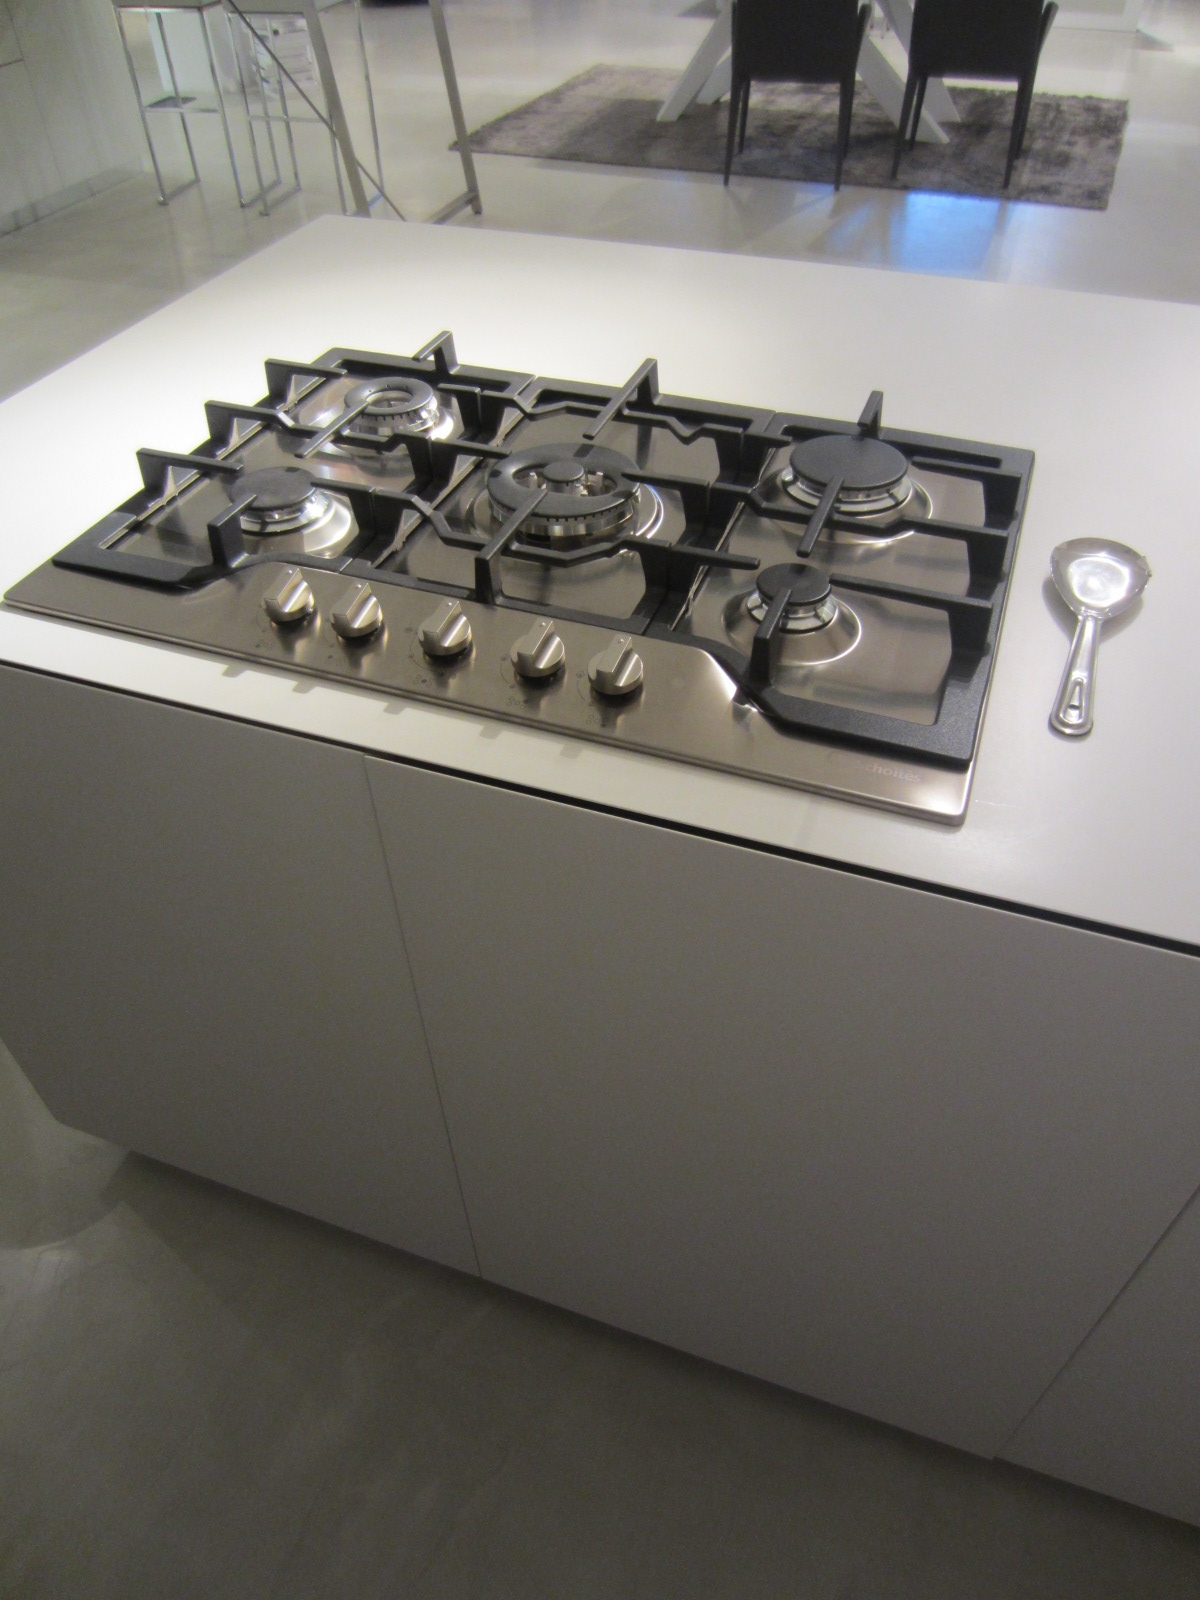 panca per cucina usata: tavoli su misura. tiarch.com idee cucina ... - Panca Per Cucina Usata